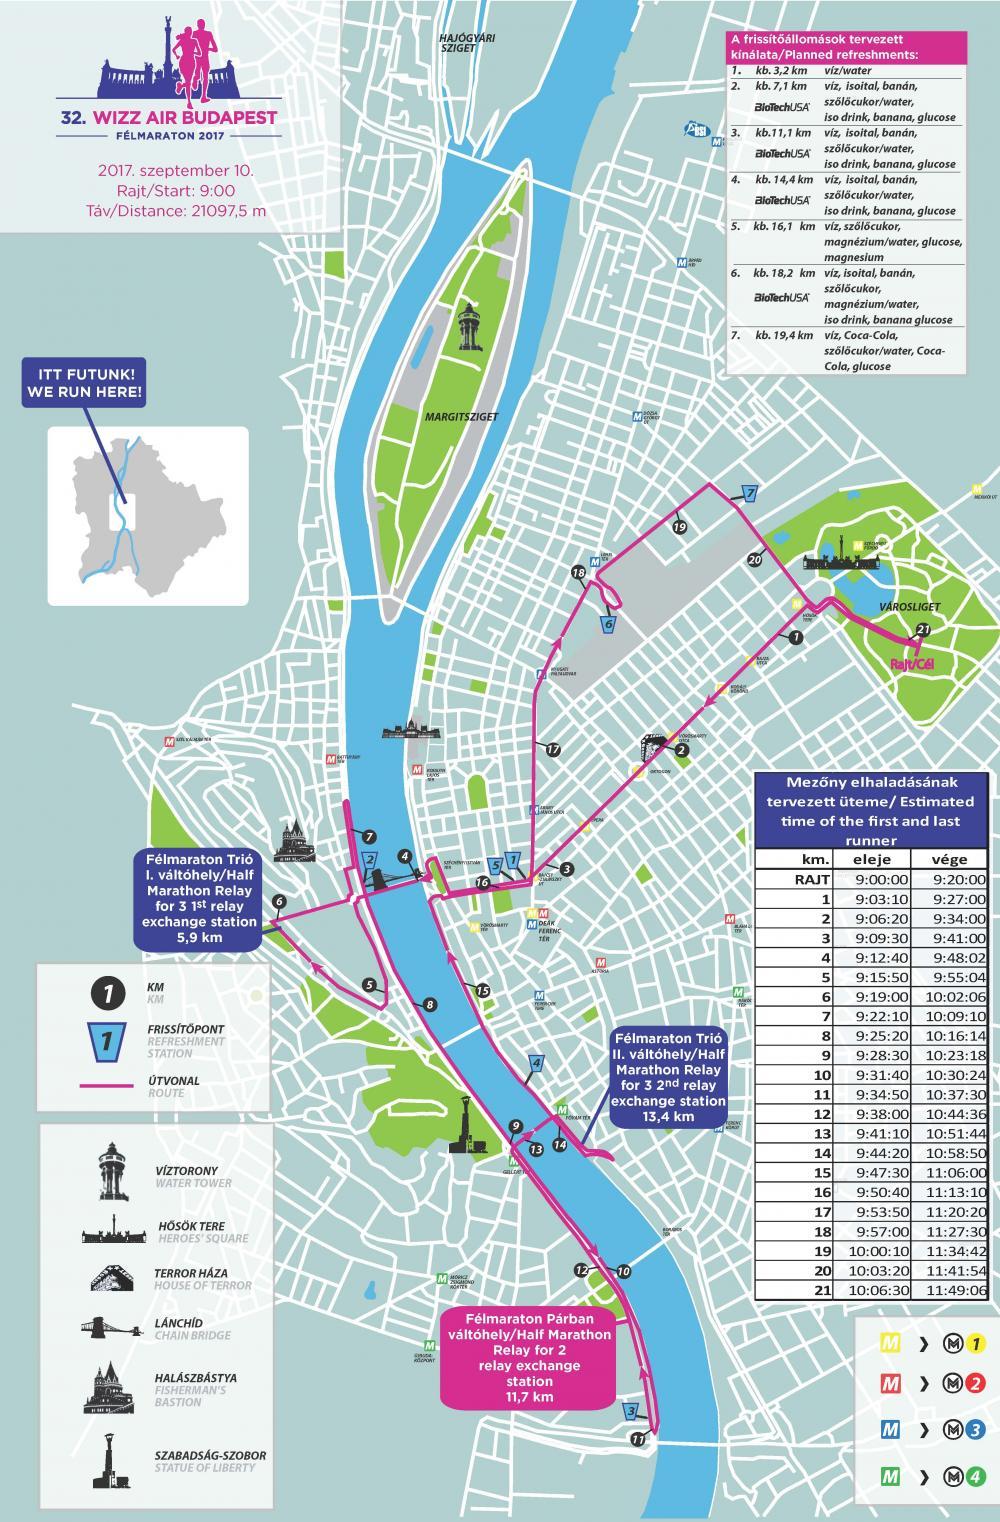 32. Wizz Air Budapest Félmaraton útvonaltérkép